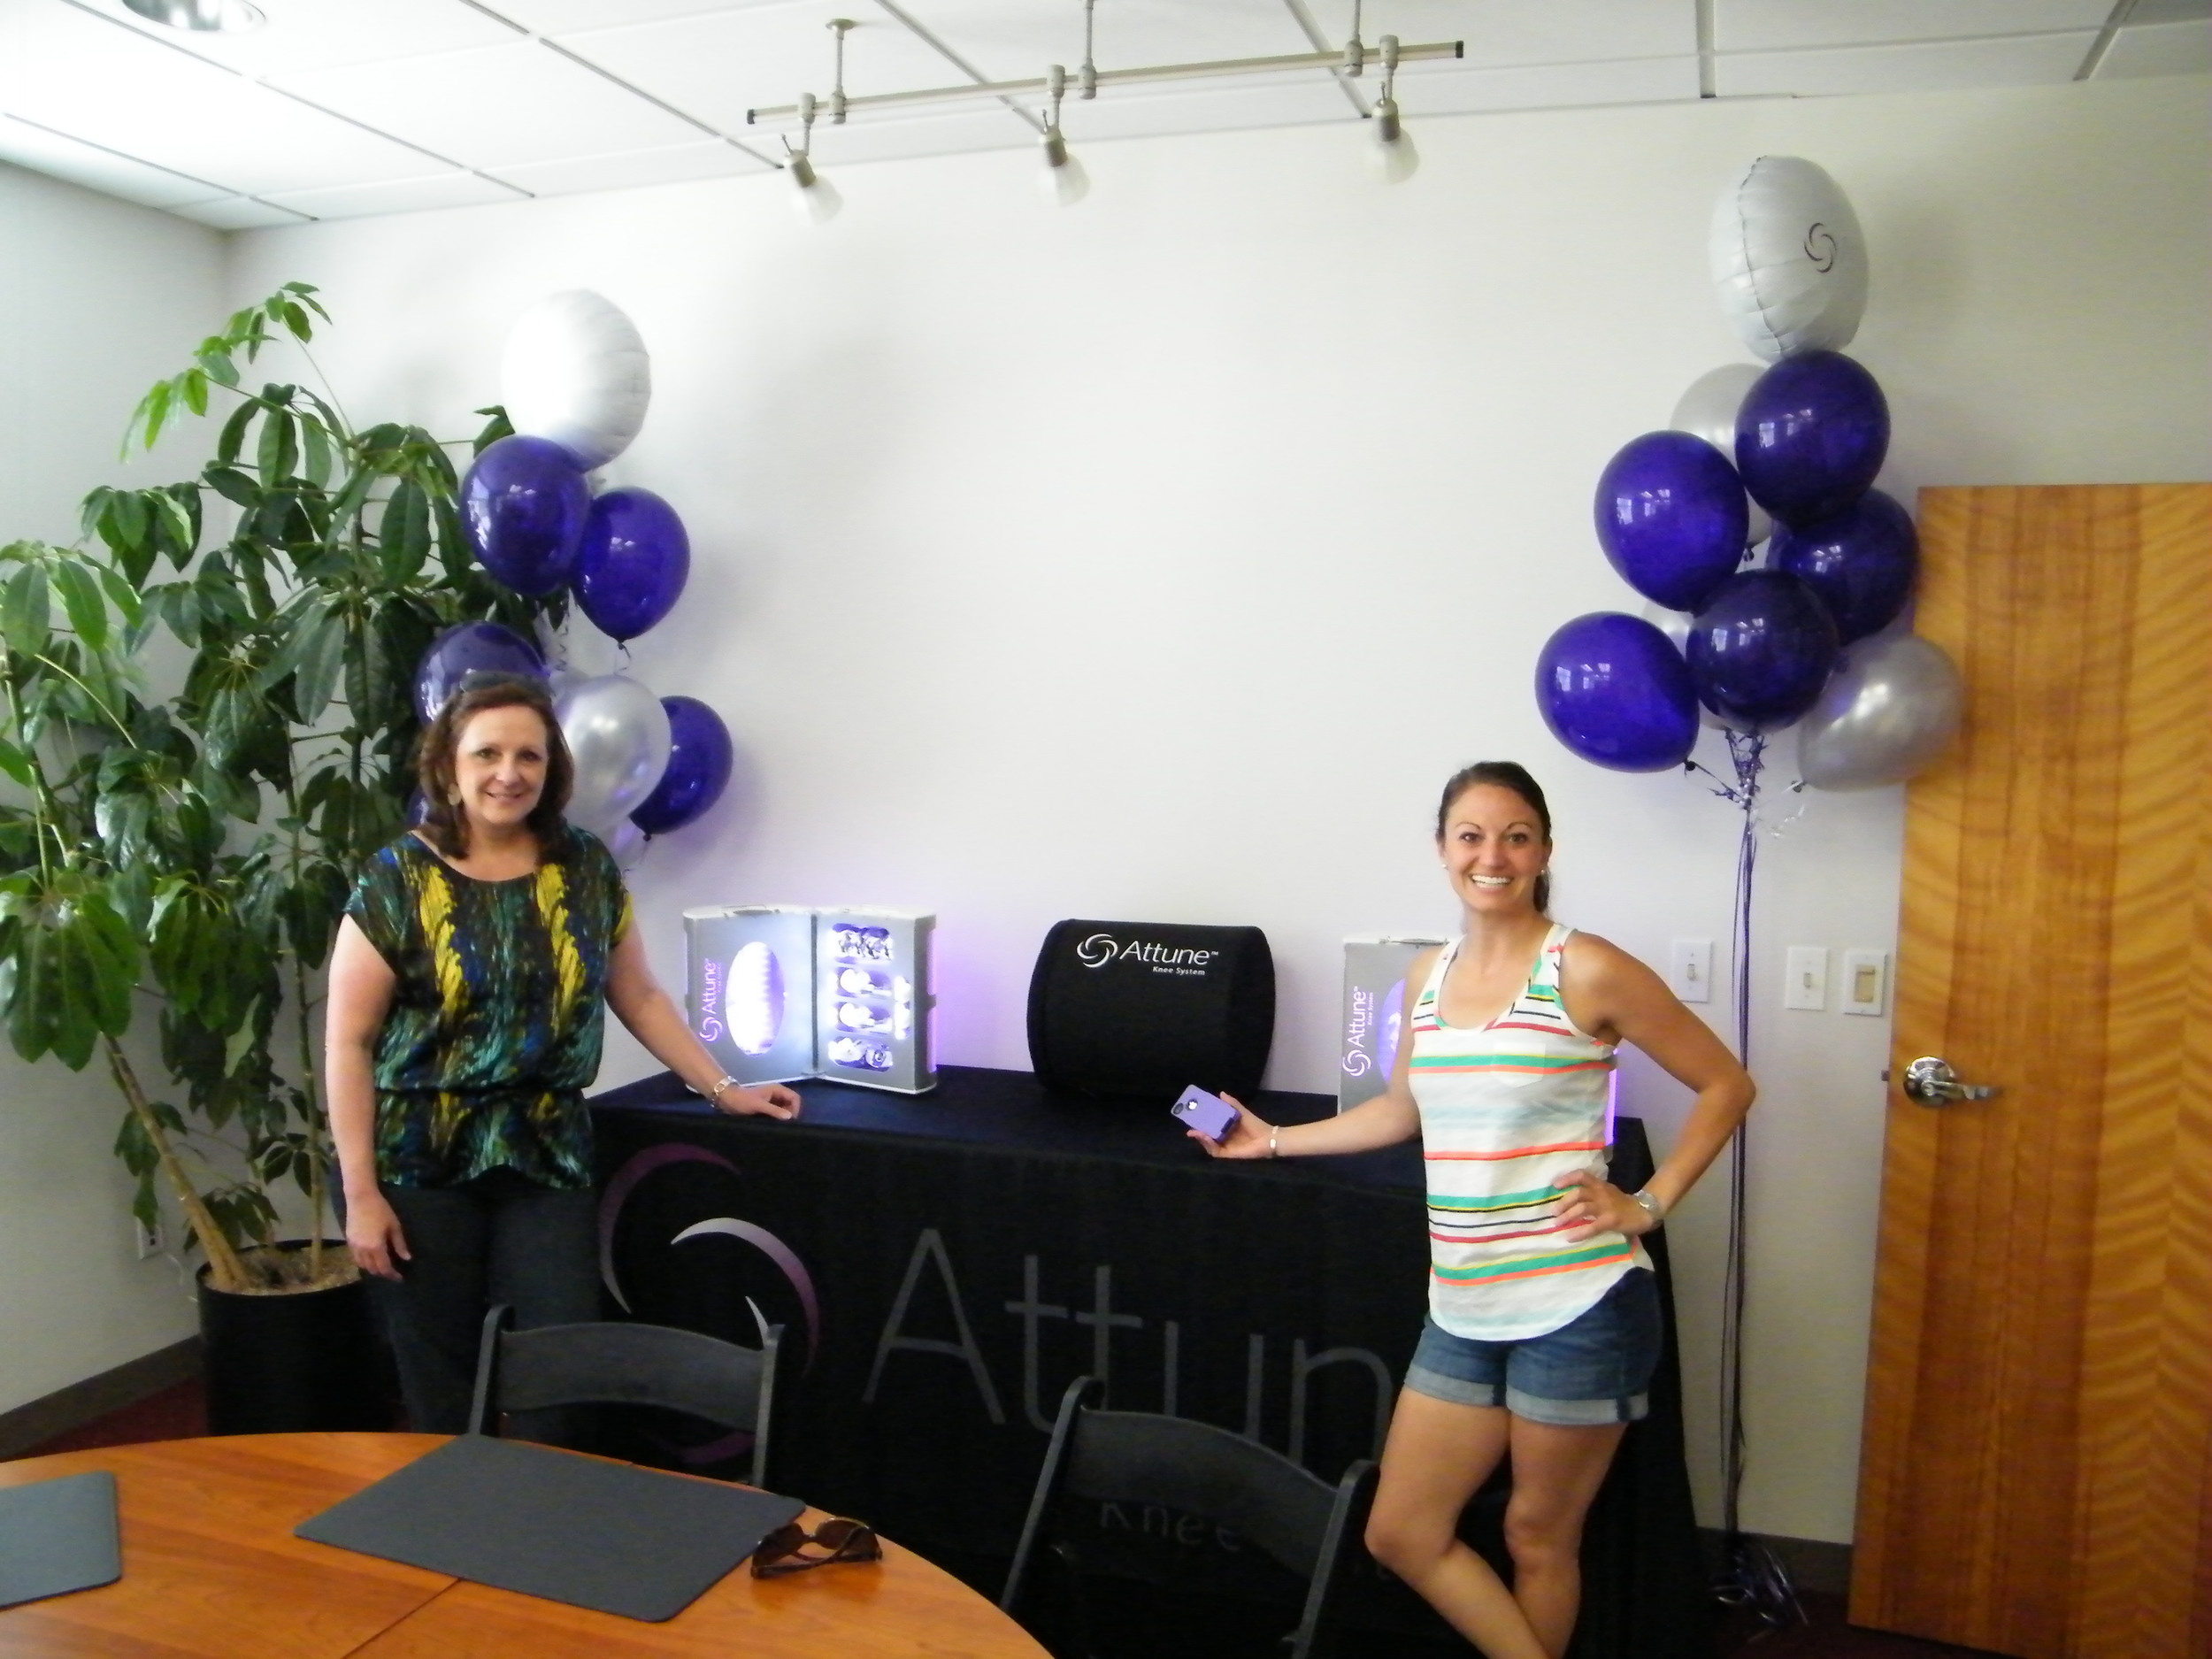 ATTUNE Launch 2013 Kara  Vickie.jpg